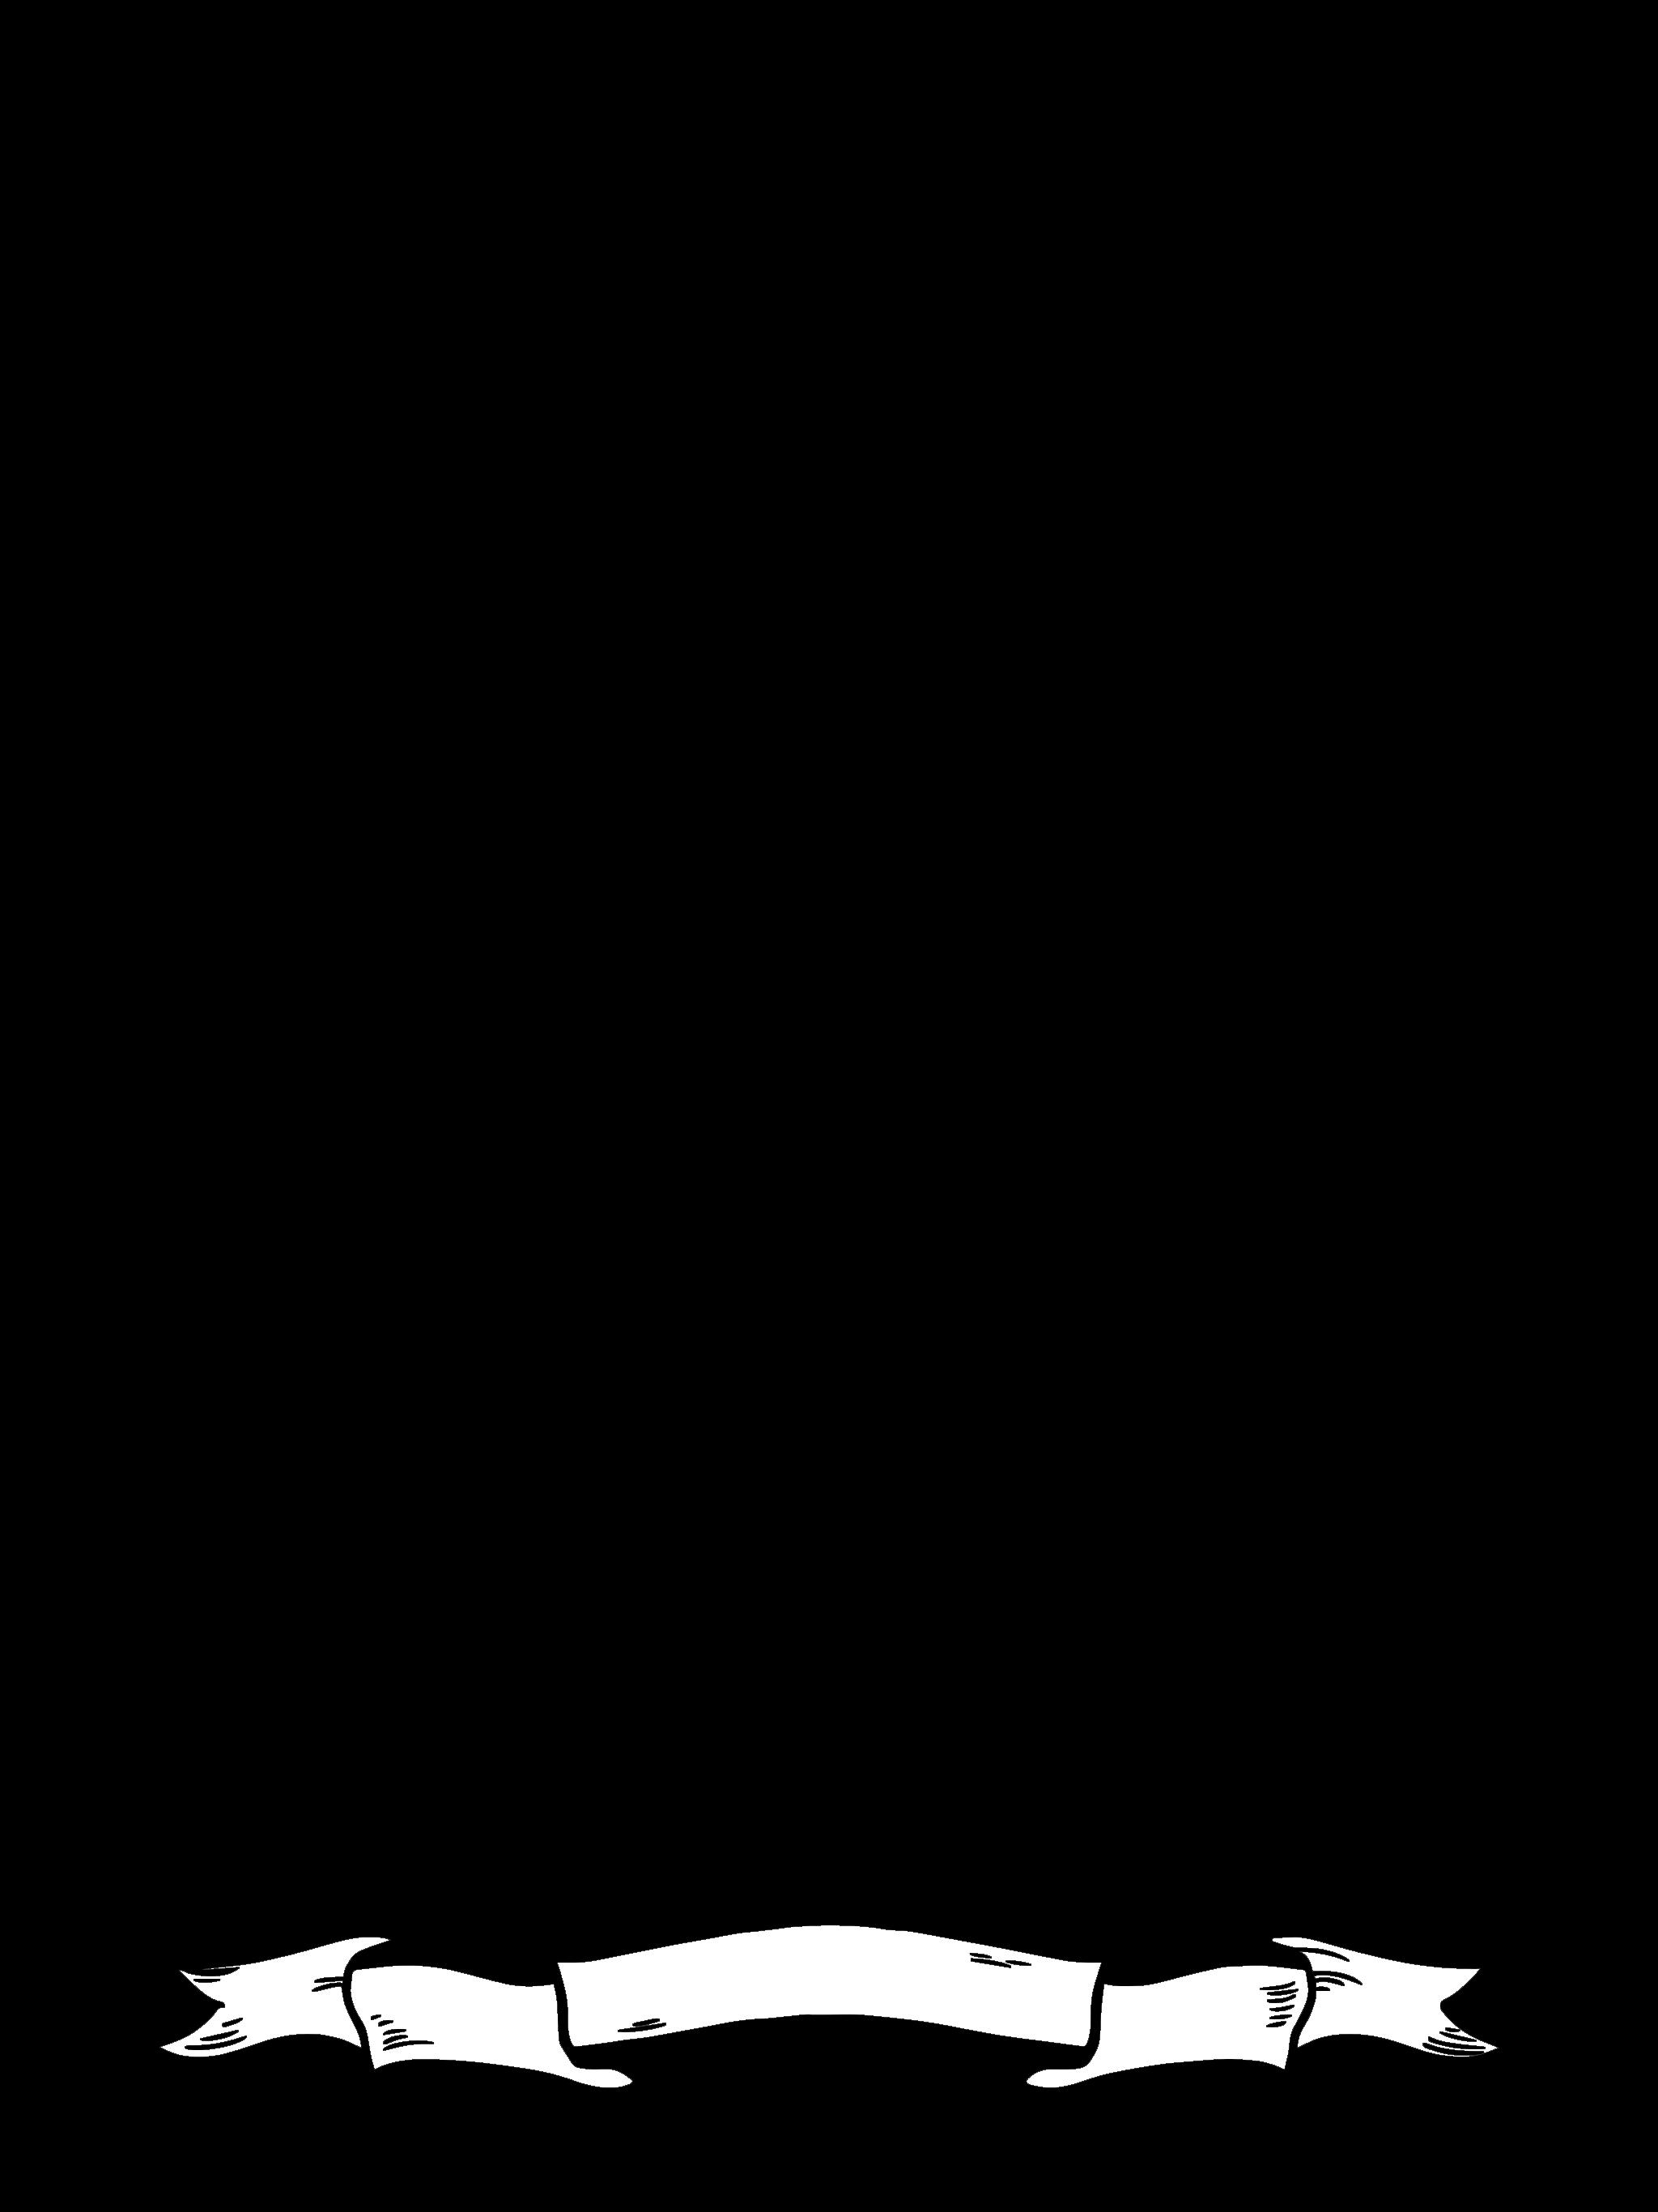 Ipad Vertical_2048x2732_Banner_Black.png